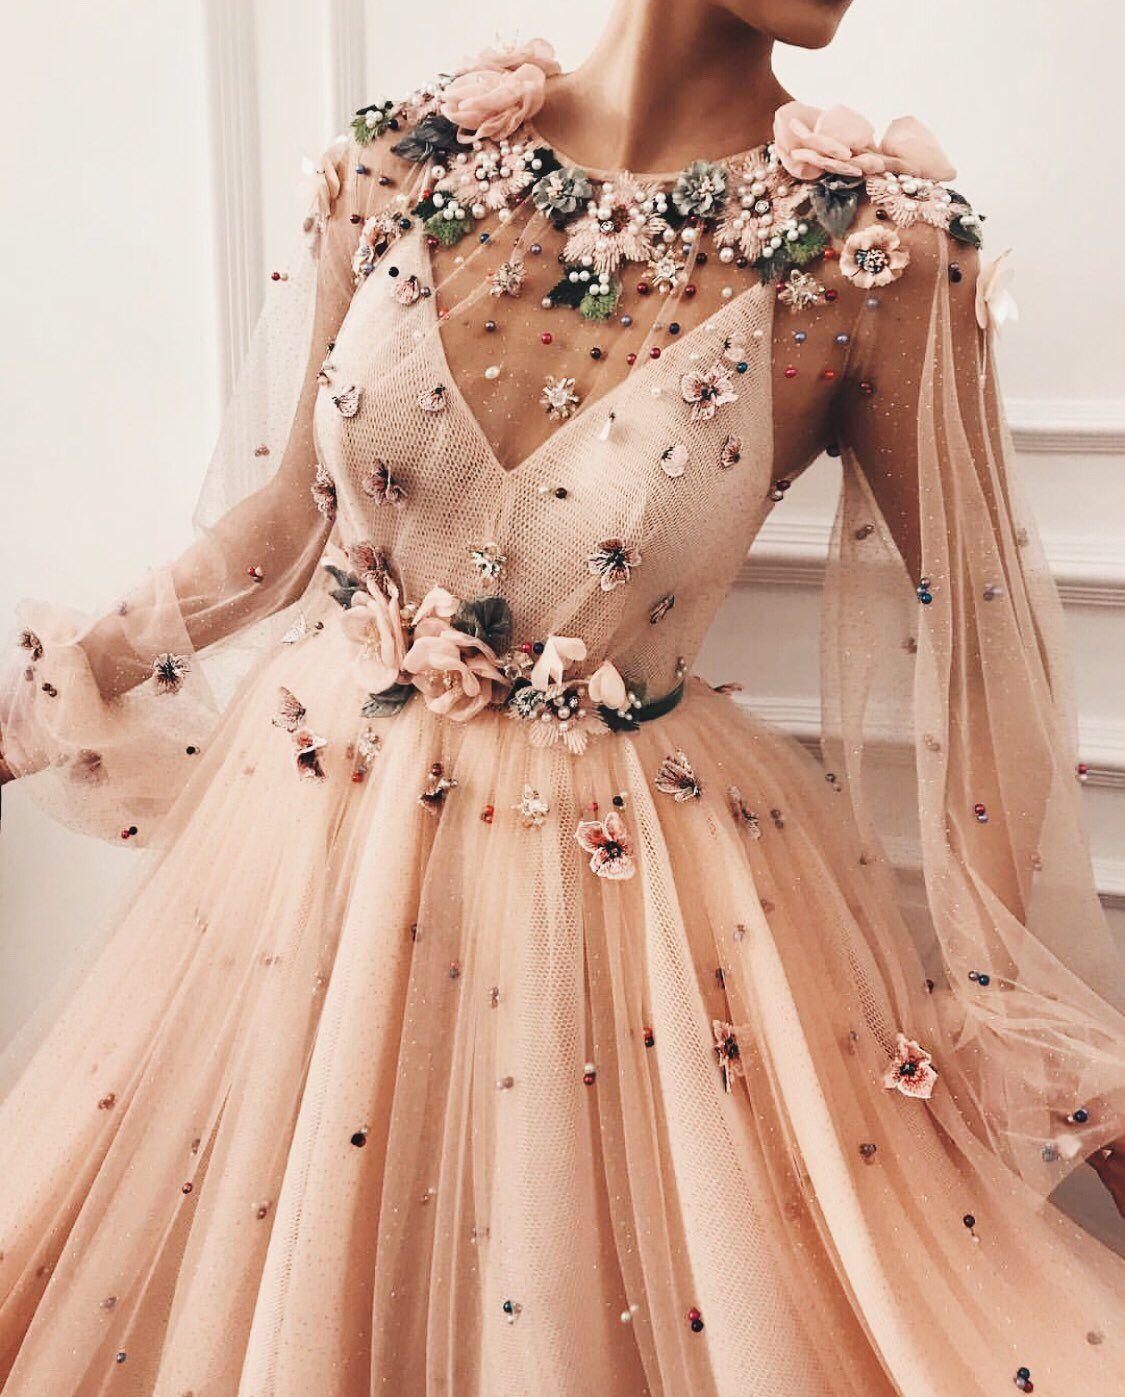 6c1d2d879f femme fatale on in 2019 | Princess | Dresses, Prom dresses, Baby ...